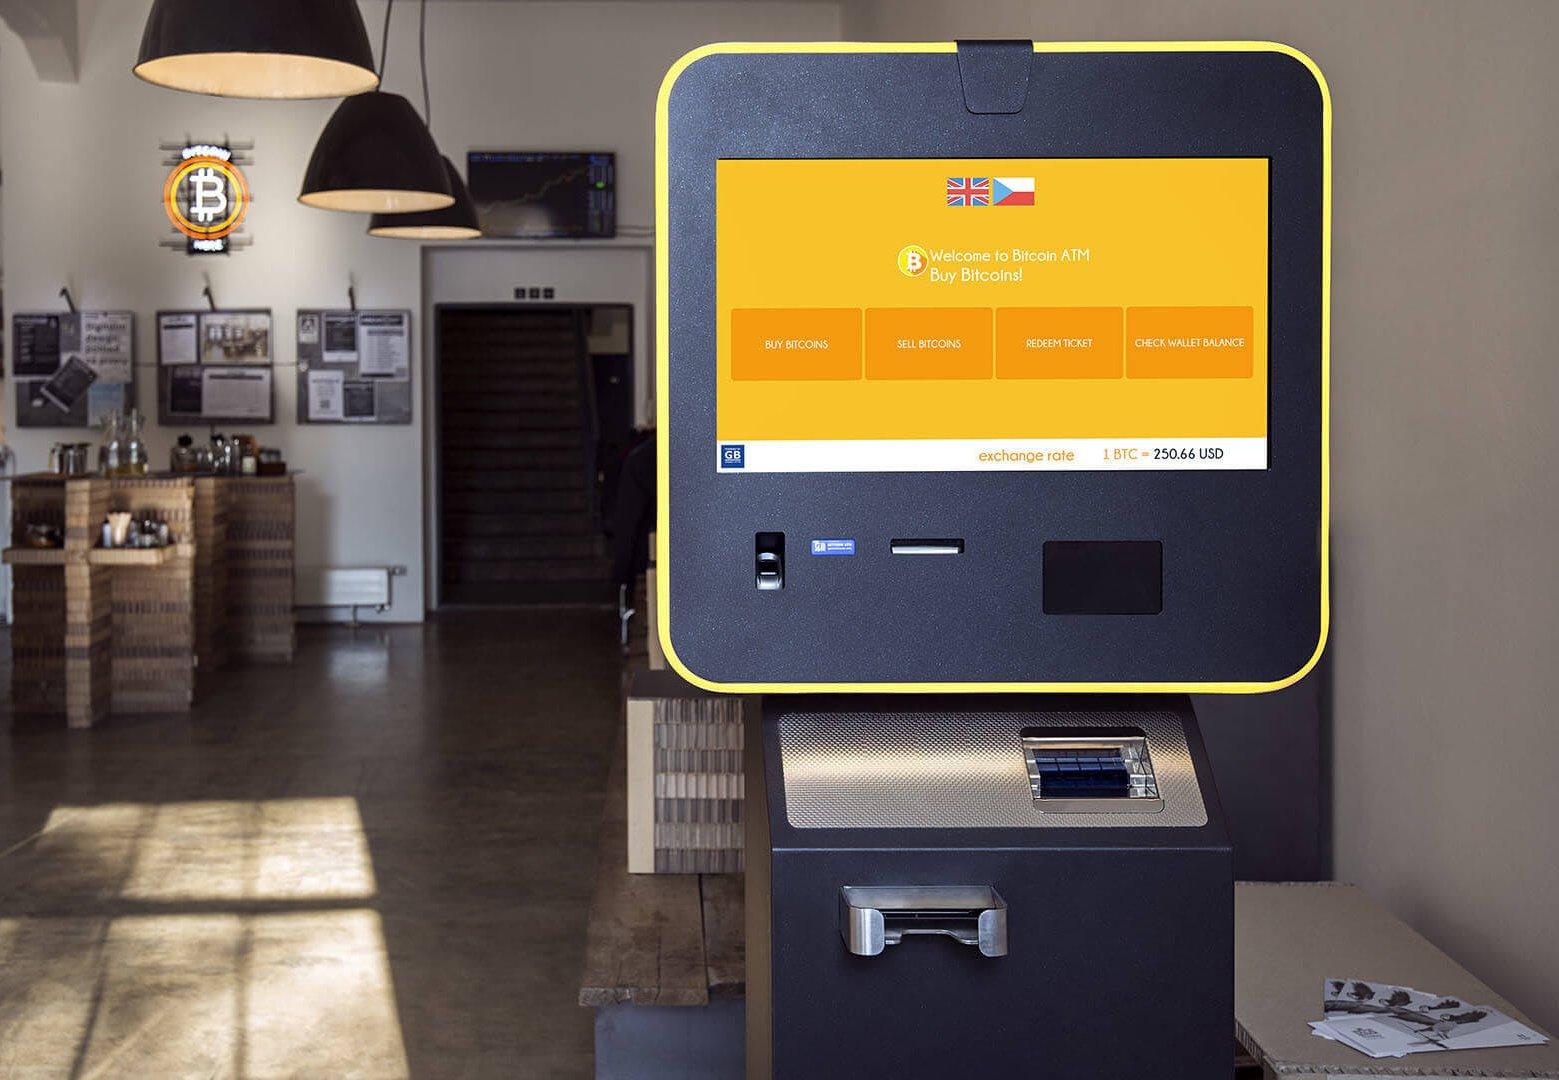 GB Bitcoin ATM